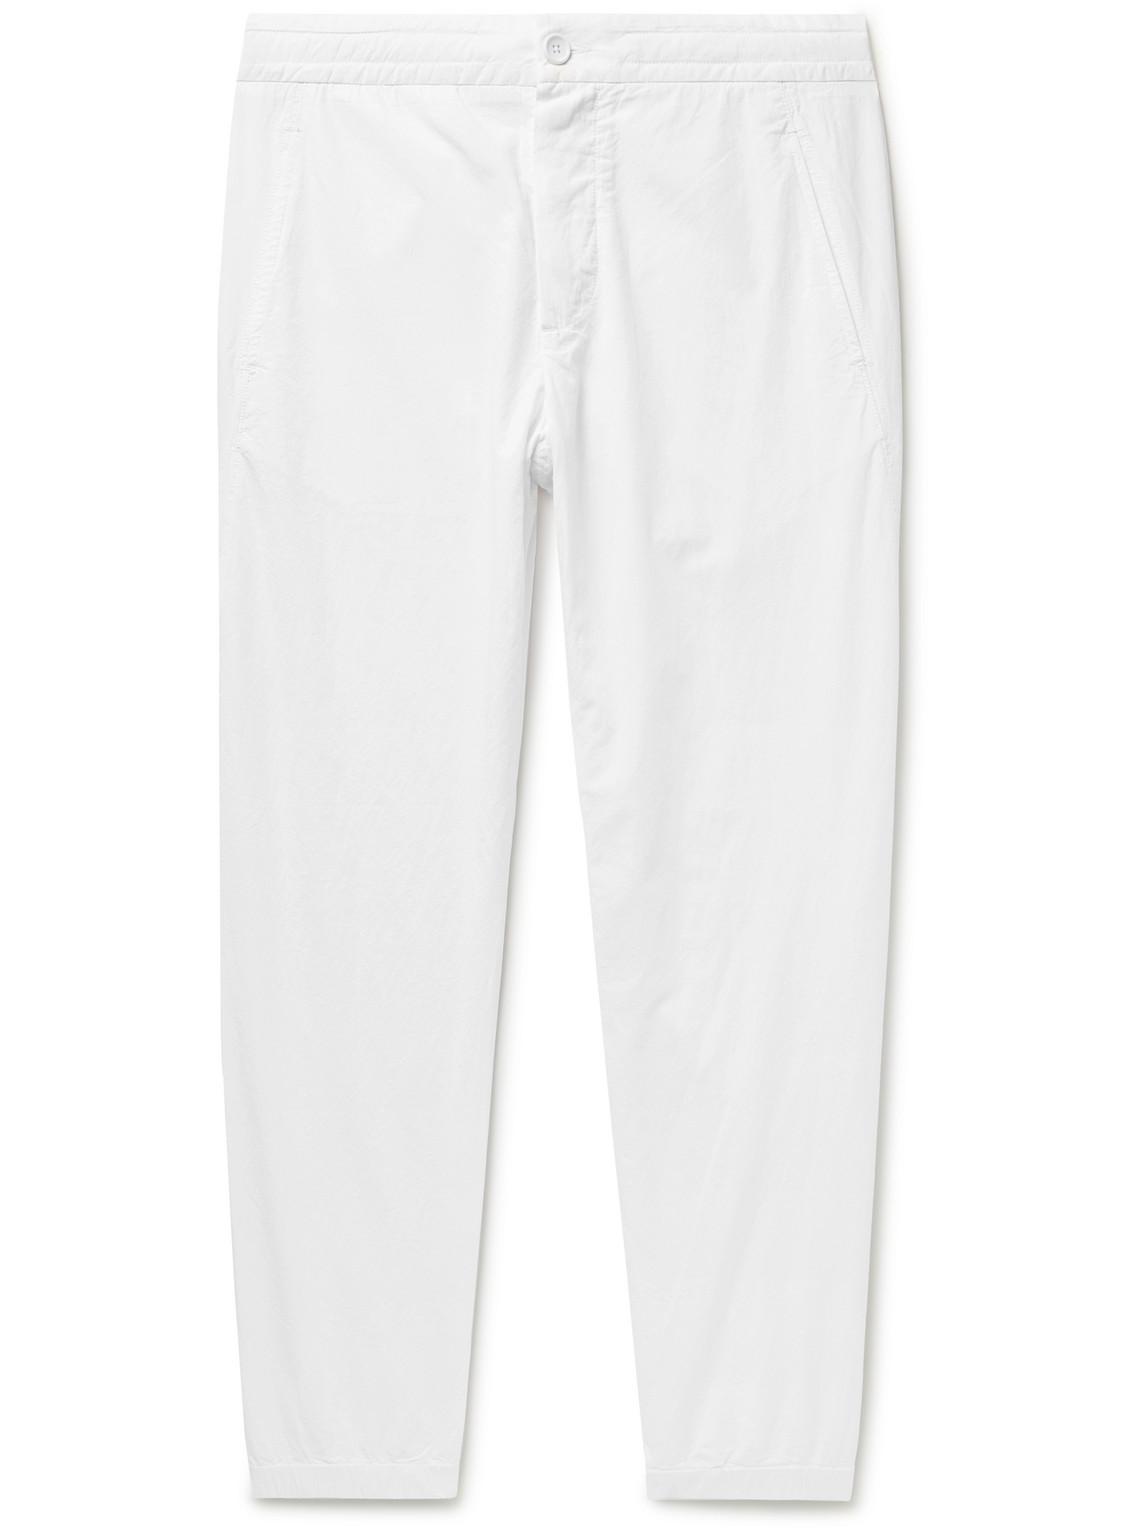 james perse - cotton-poplin trousers - men - white - uk/us 30